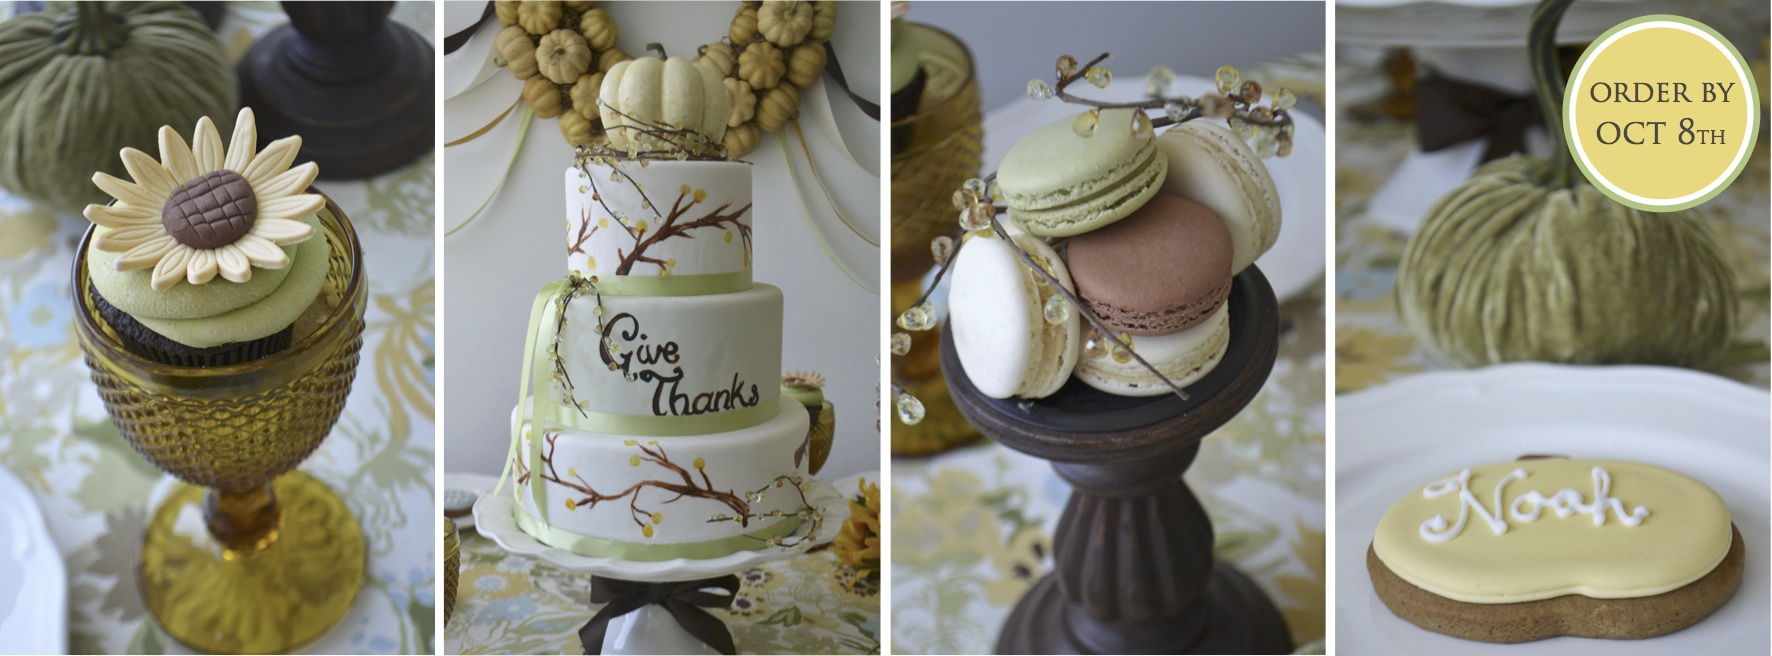 Bake Sale Thanksgiving Desserts Facebook.jpg